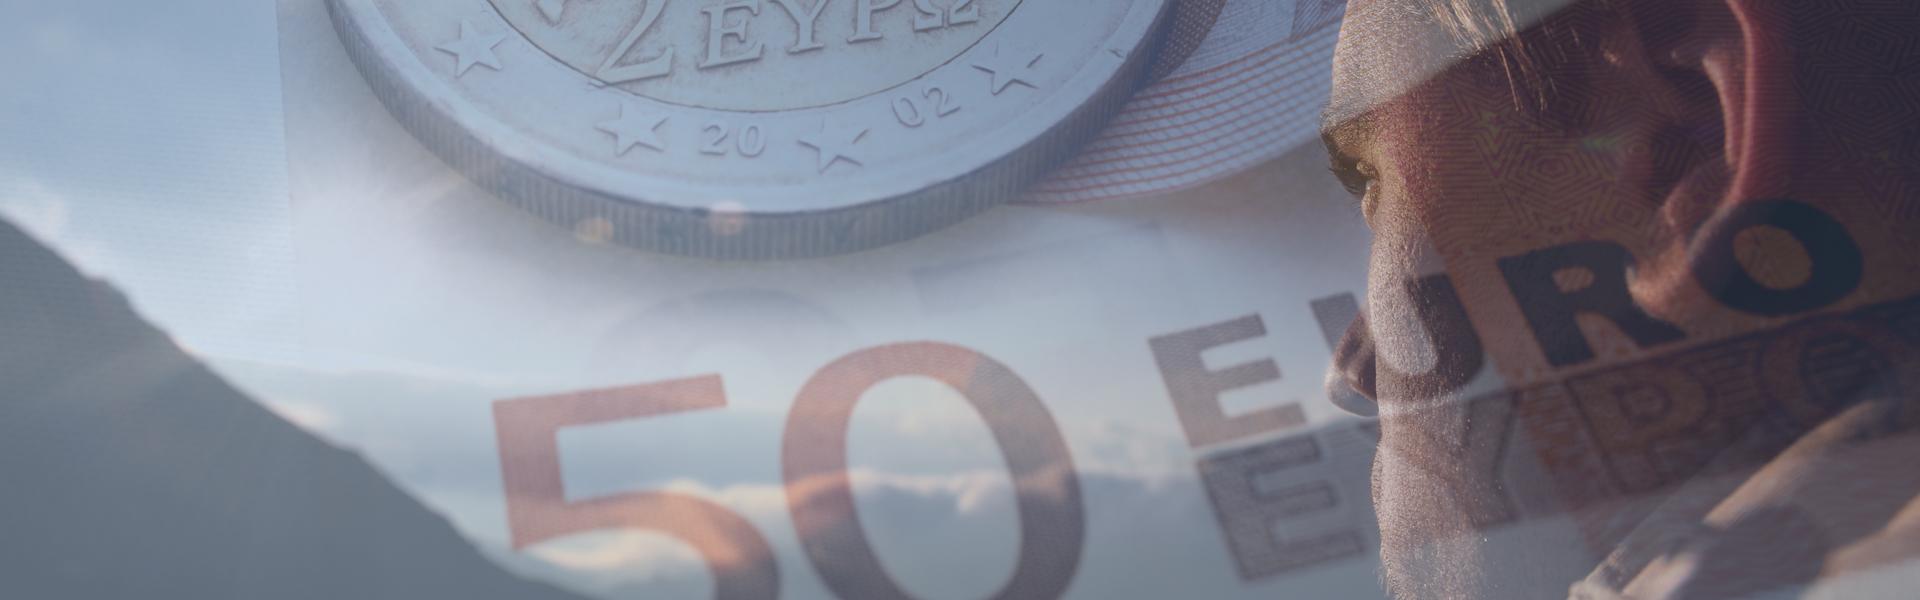 cyprus-bankaccount.jpg